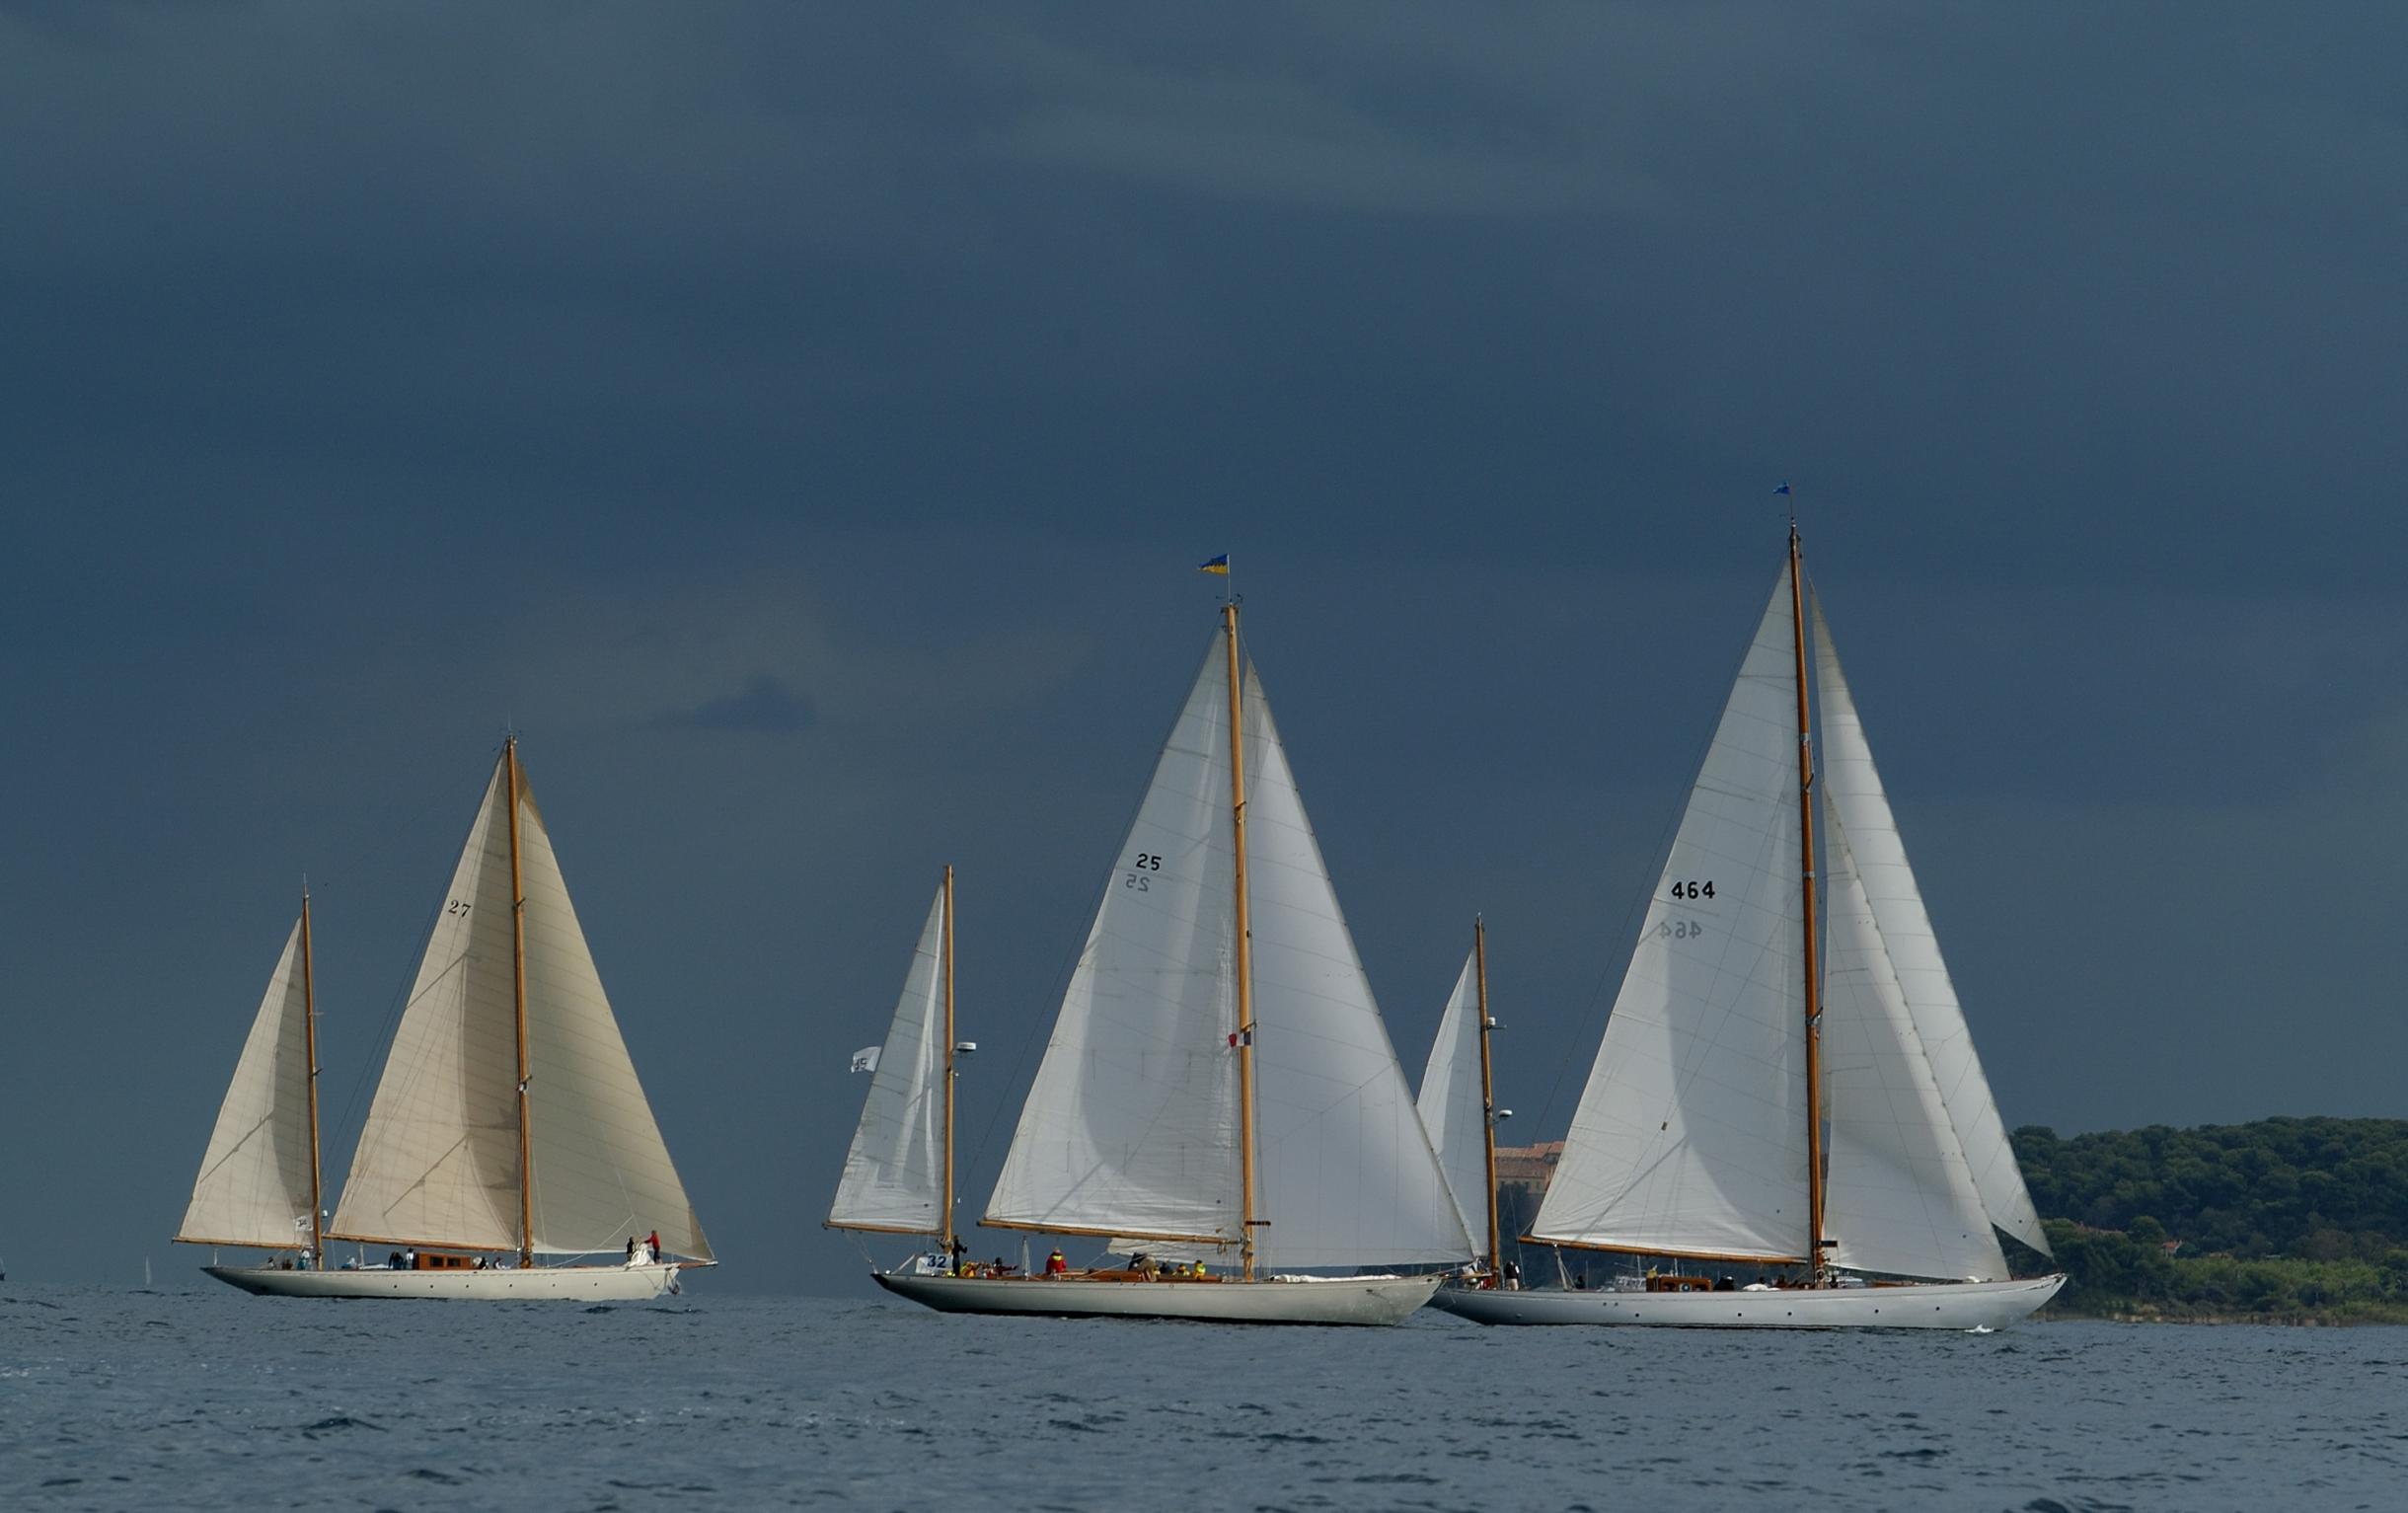 Chantier Navals de Normandie | Экстрьер 10